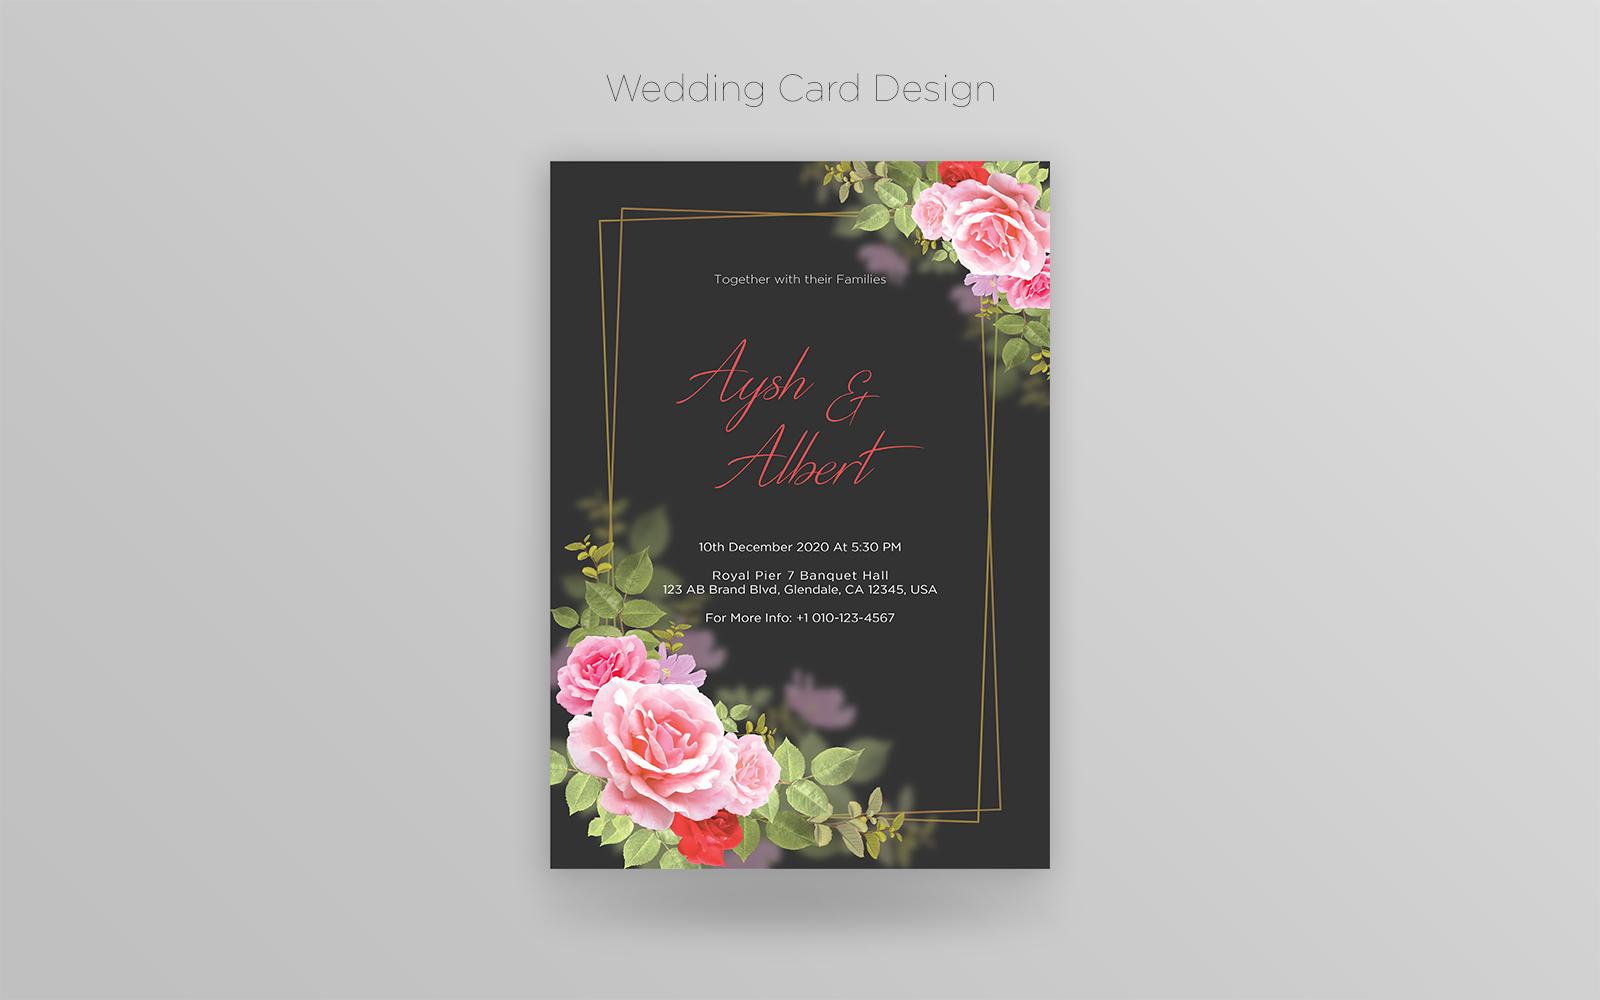 Creative Floral Wedding Card PSD sablon 126233